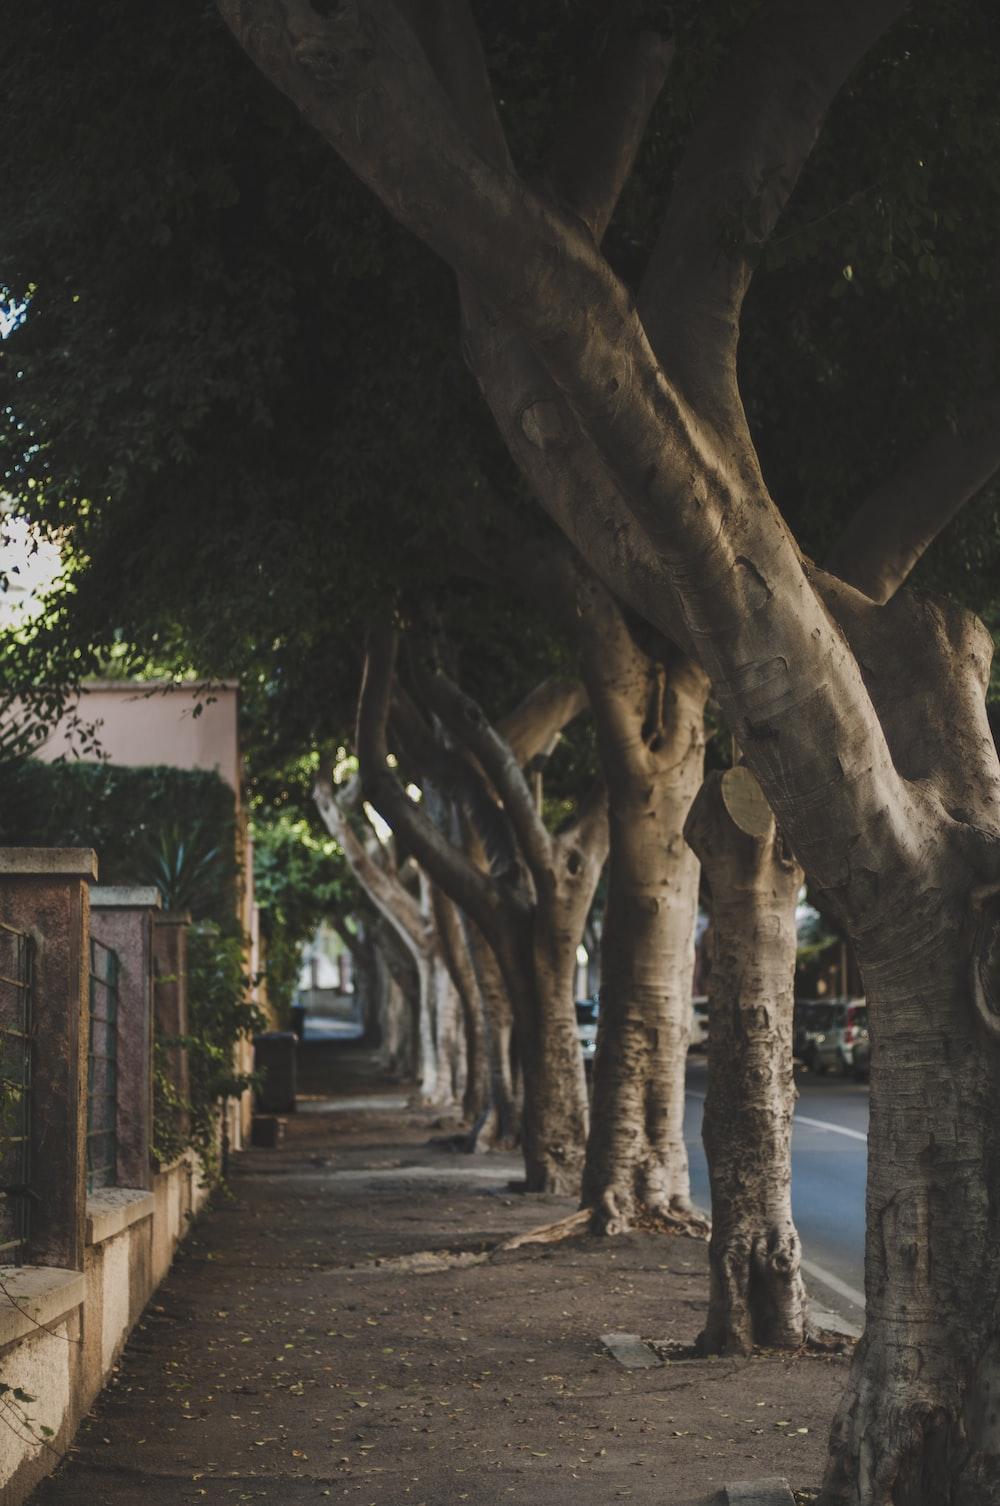 brown tree trunk near road